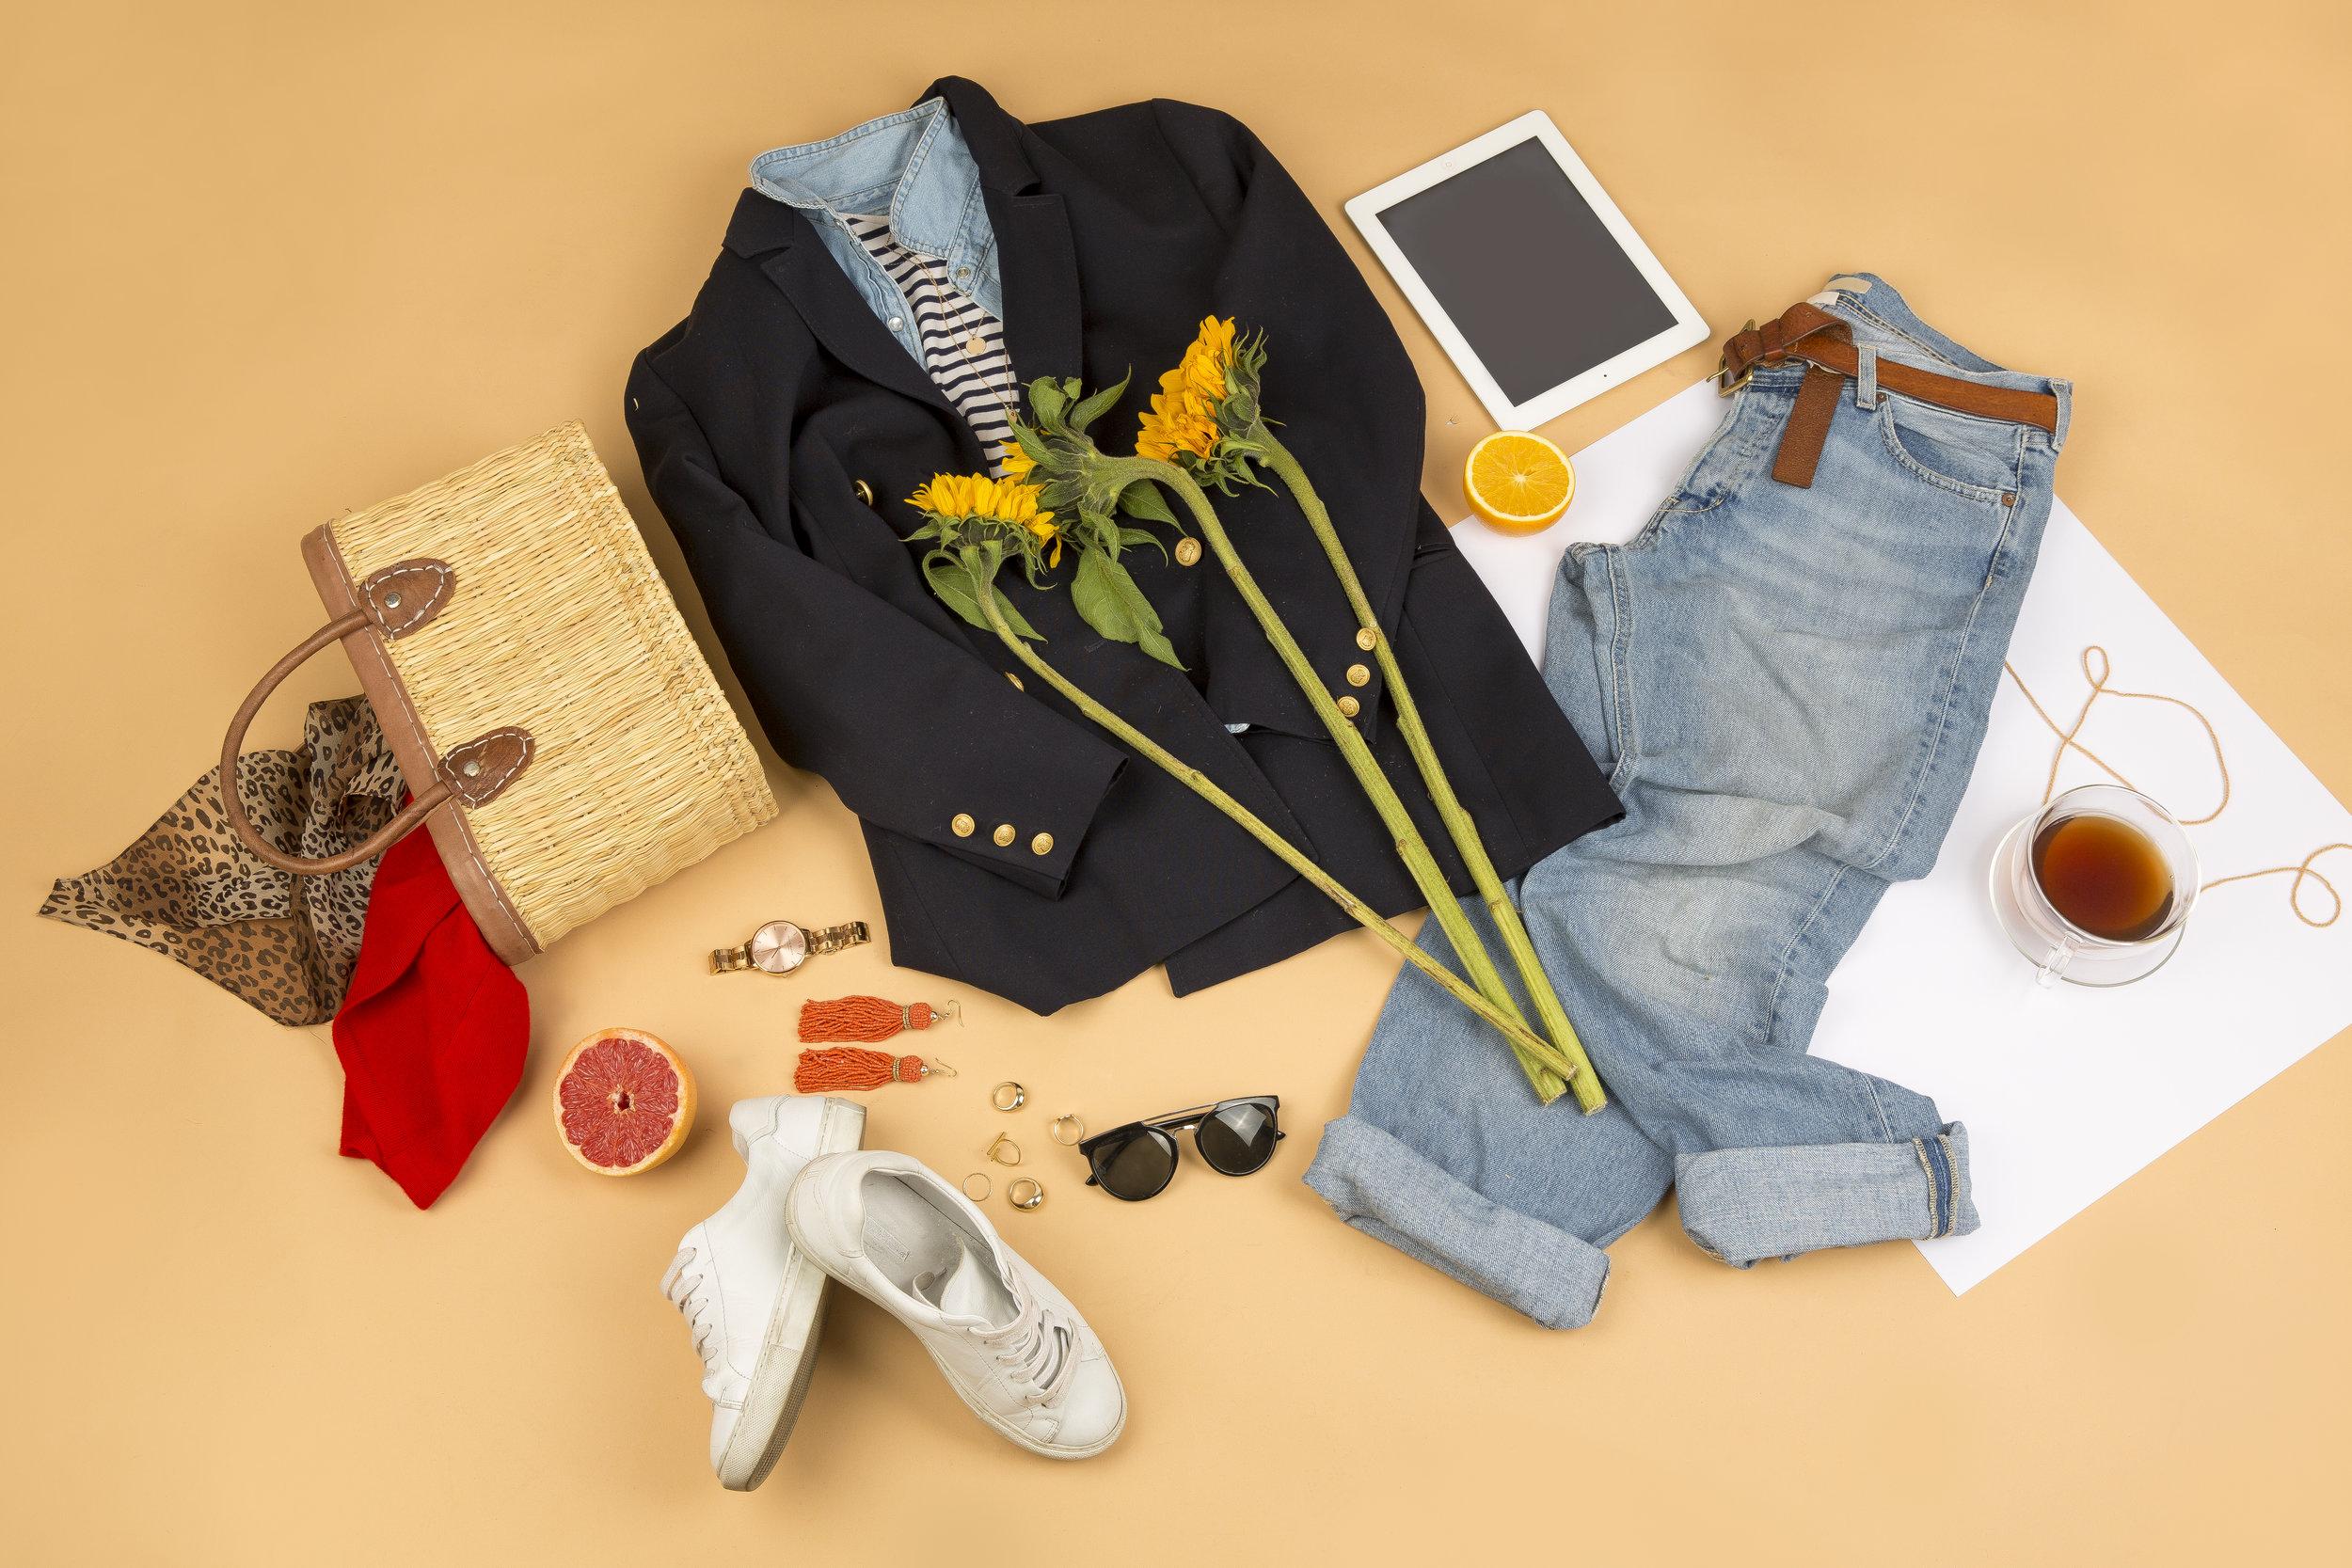 Outfit Build Wardrobe Overhaul Alison McDougal Personal Stylist.jpg